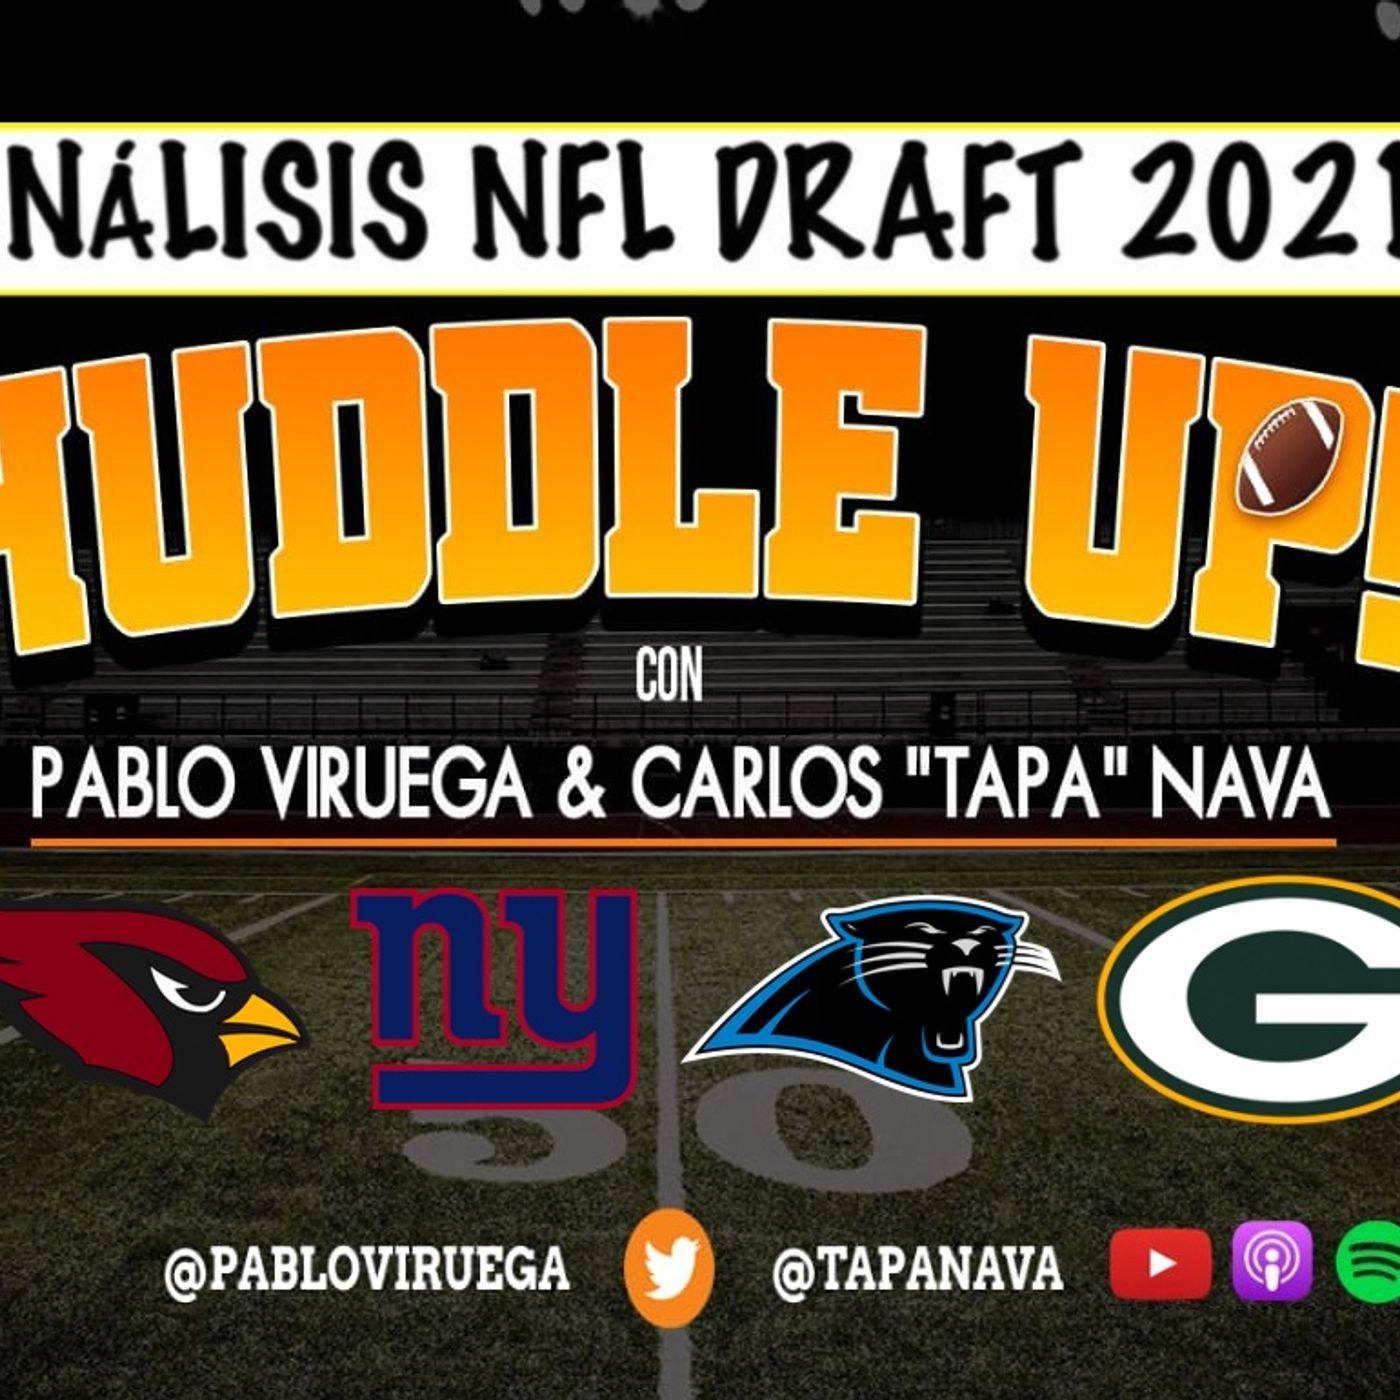 #HuddleUP Análisis #NFLDraft #Panthers #Giants #Cardinals #Packers con @TapaNava y @PabloViruega